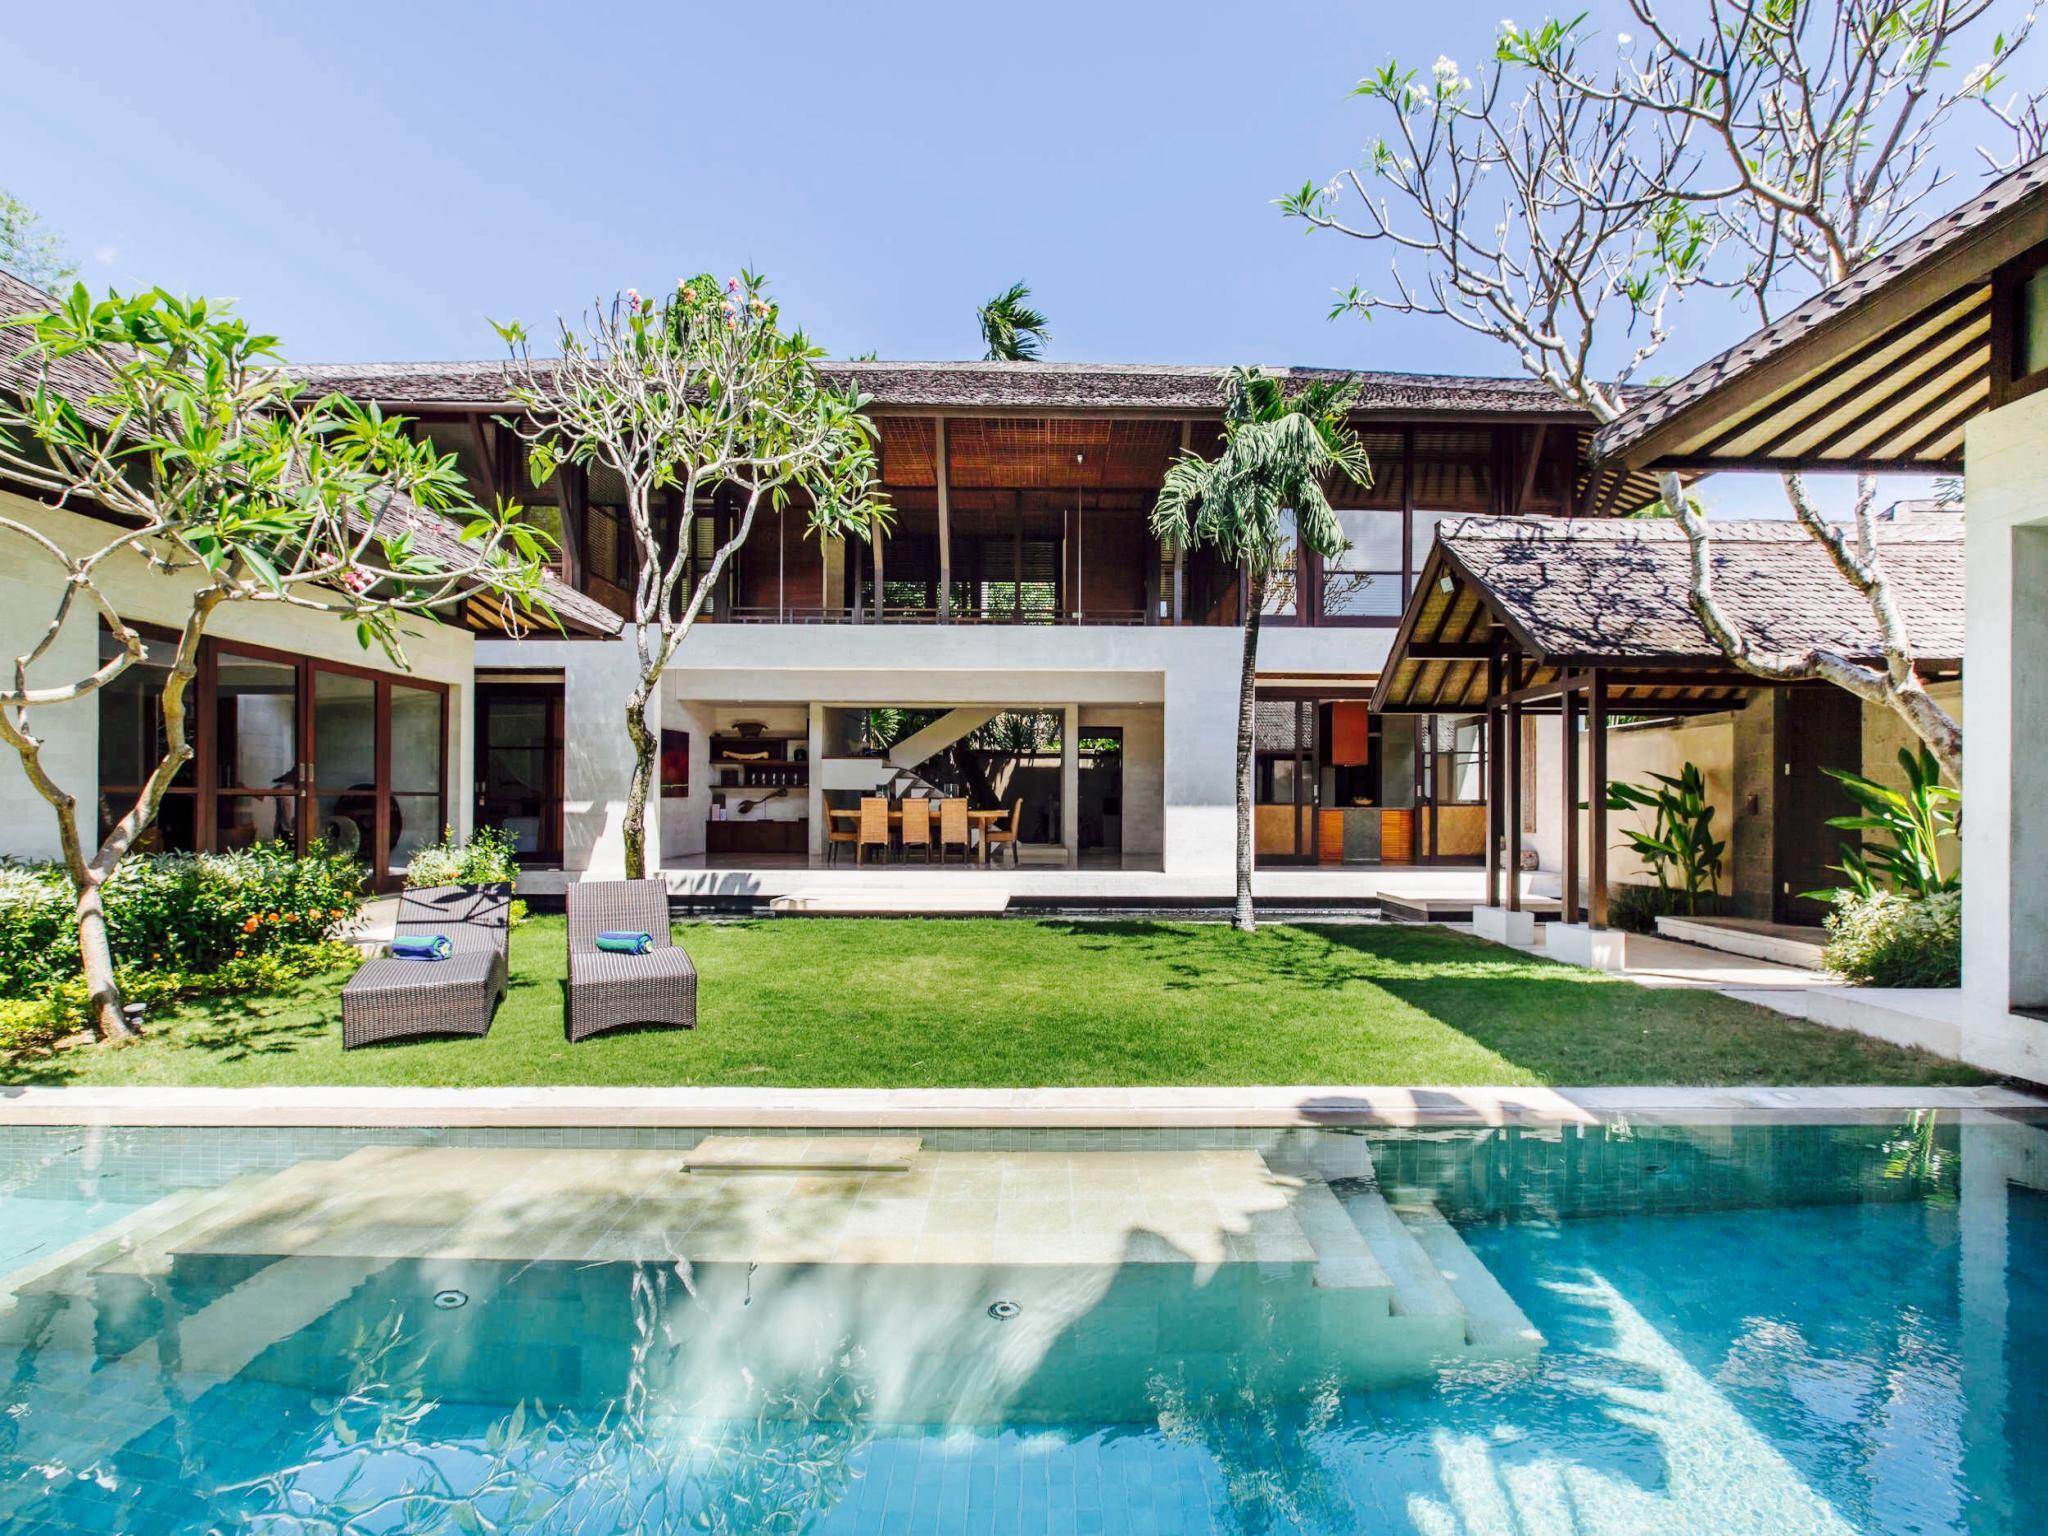 Villa Air Bali Boutique Resort And Spa Seminyak Bali Indonesia Great Discounted Rates